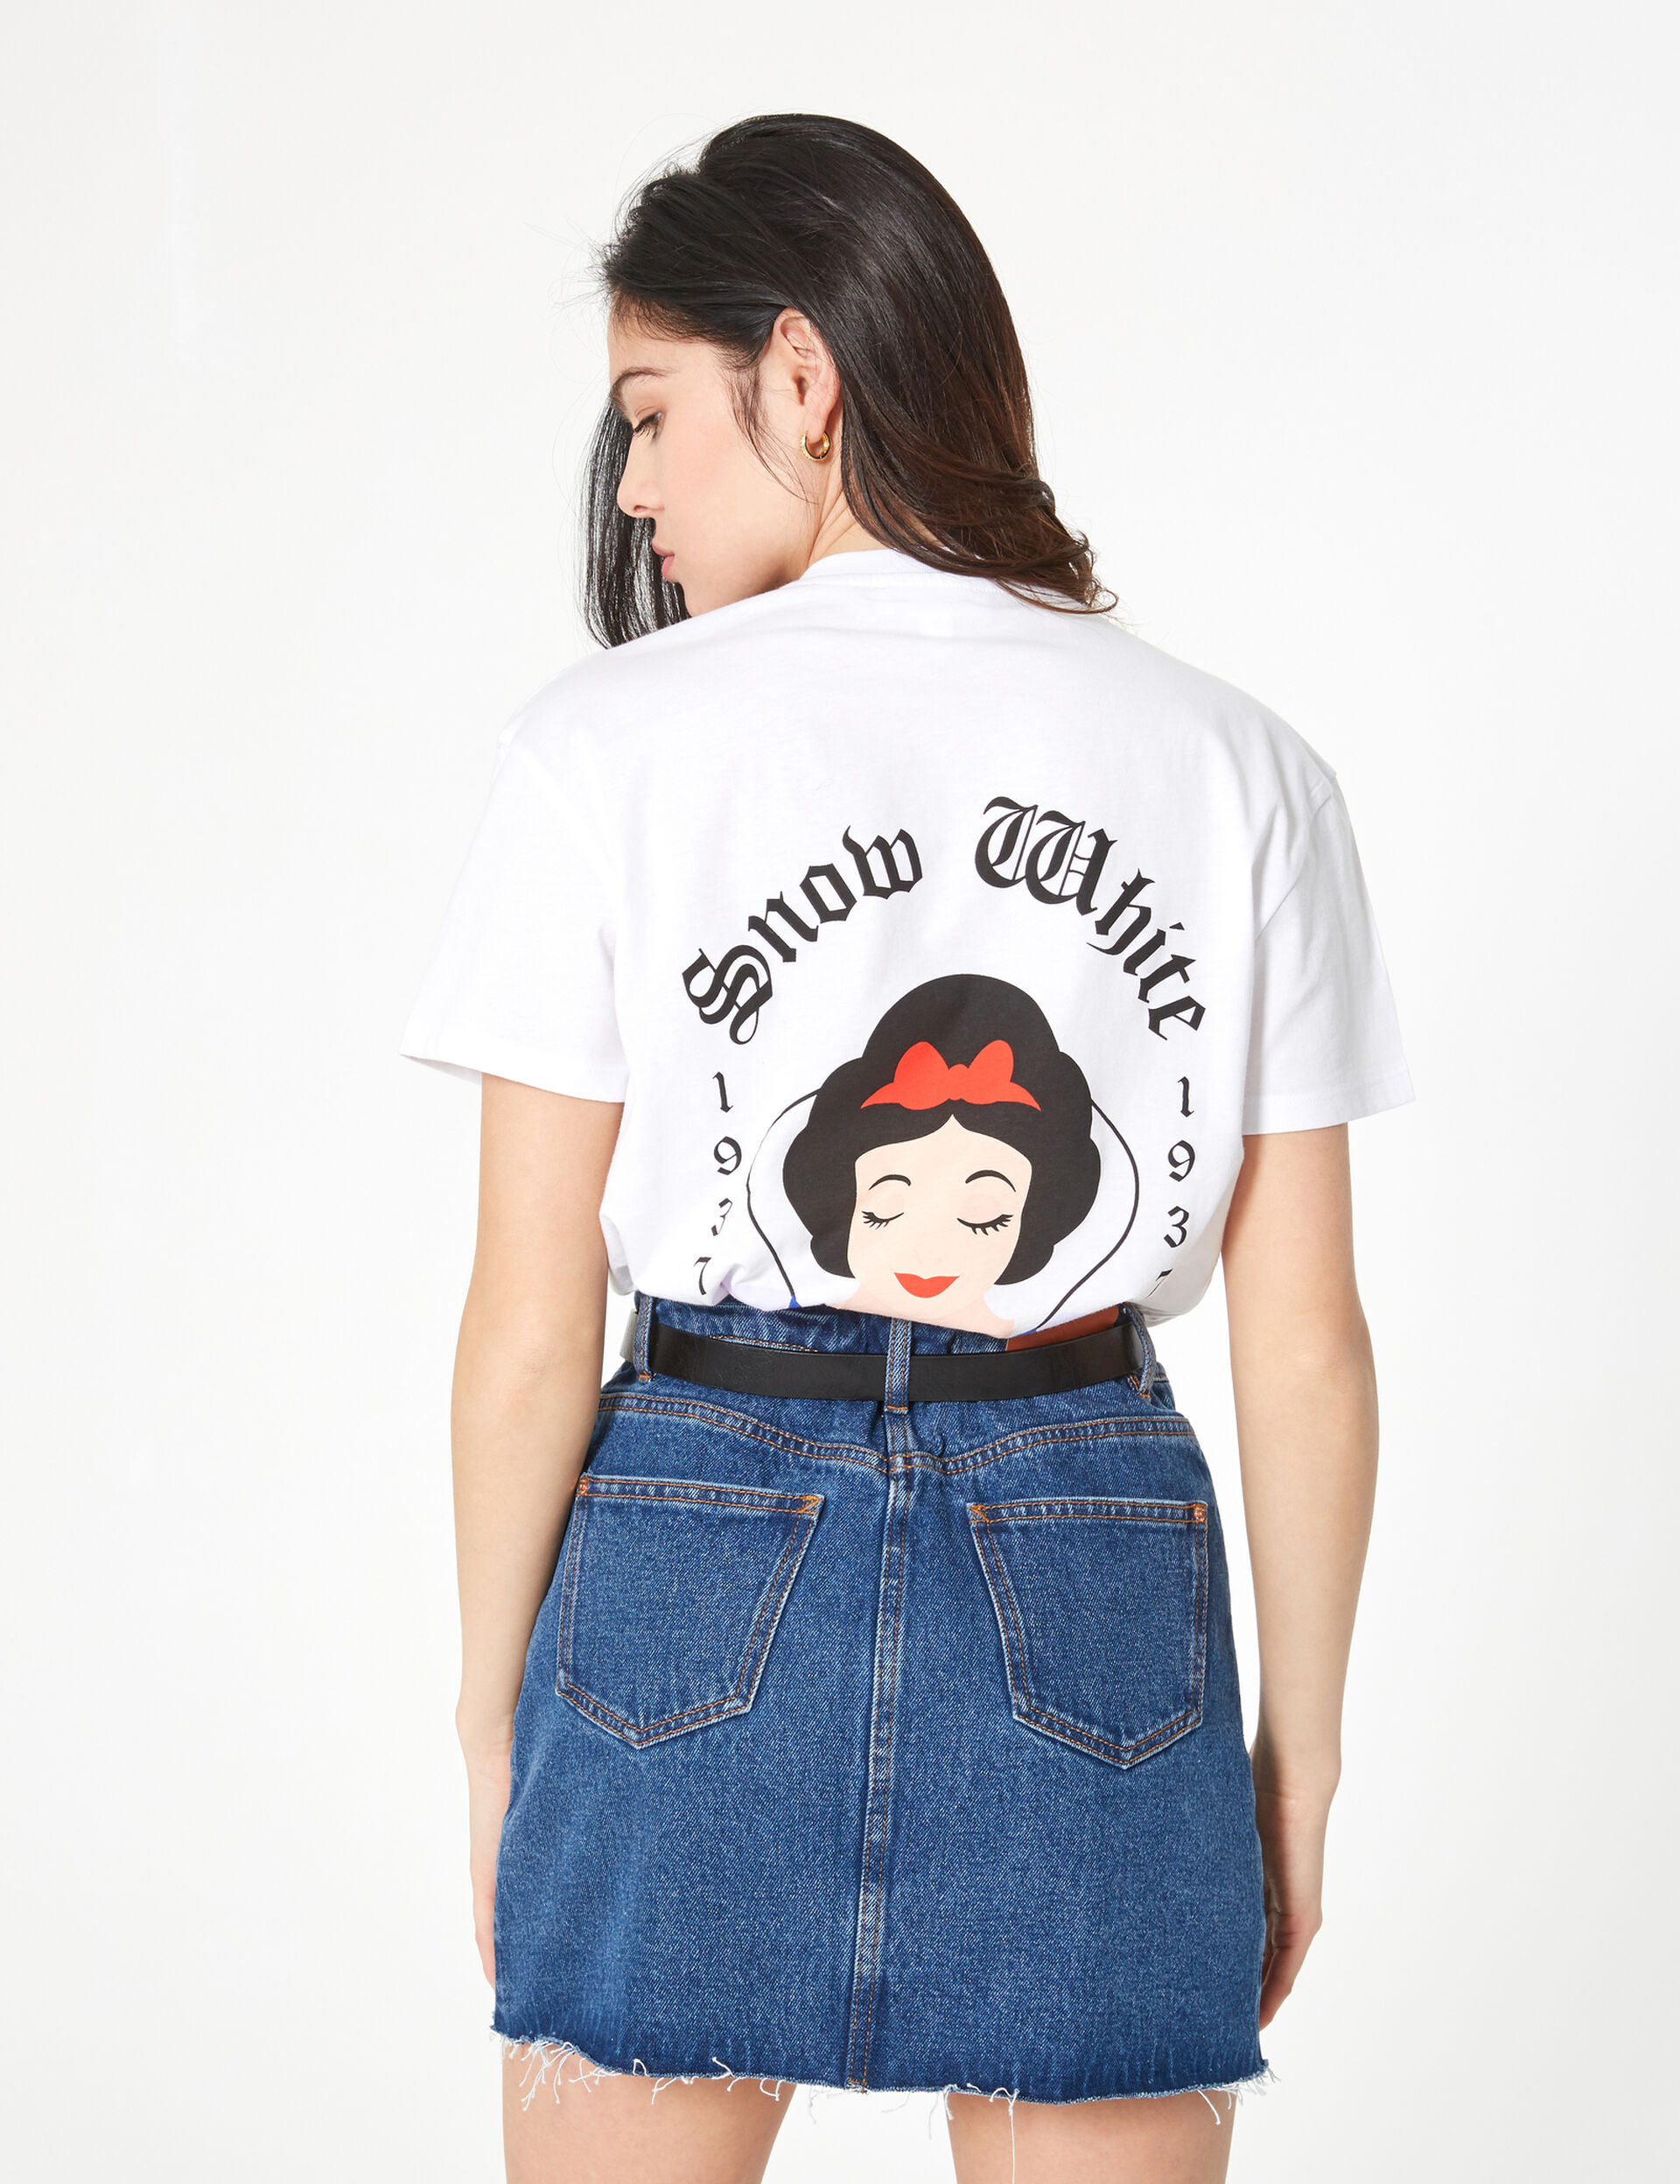 Tee-shirt Disney Blanche Neige